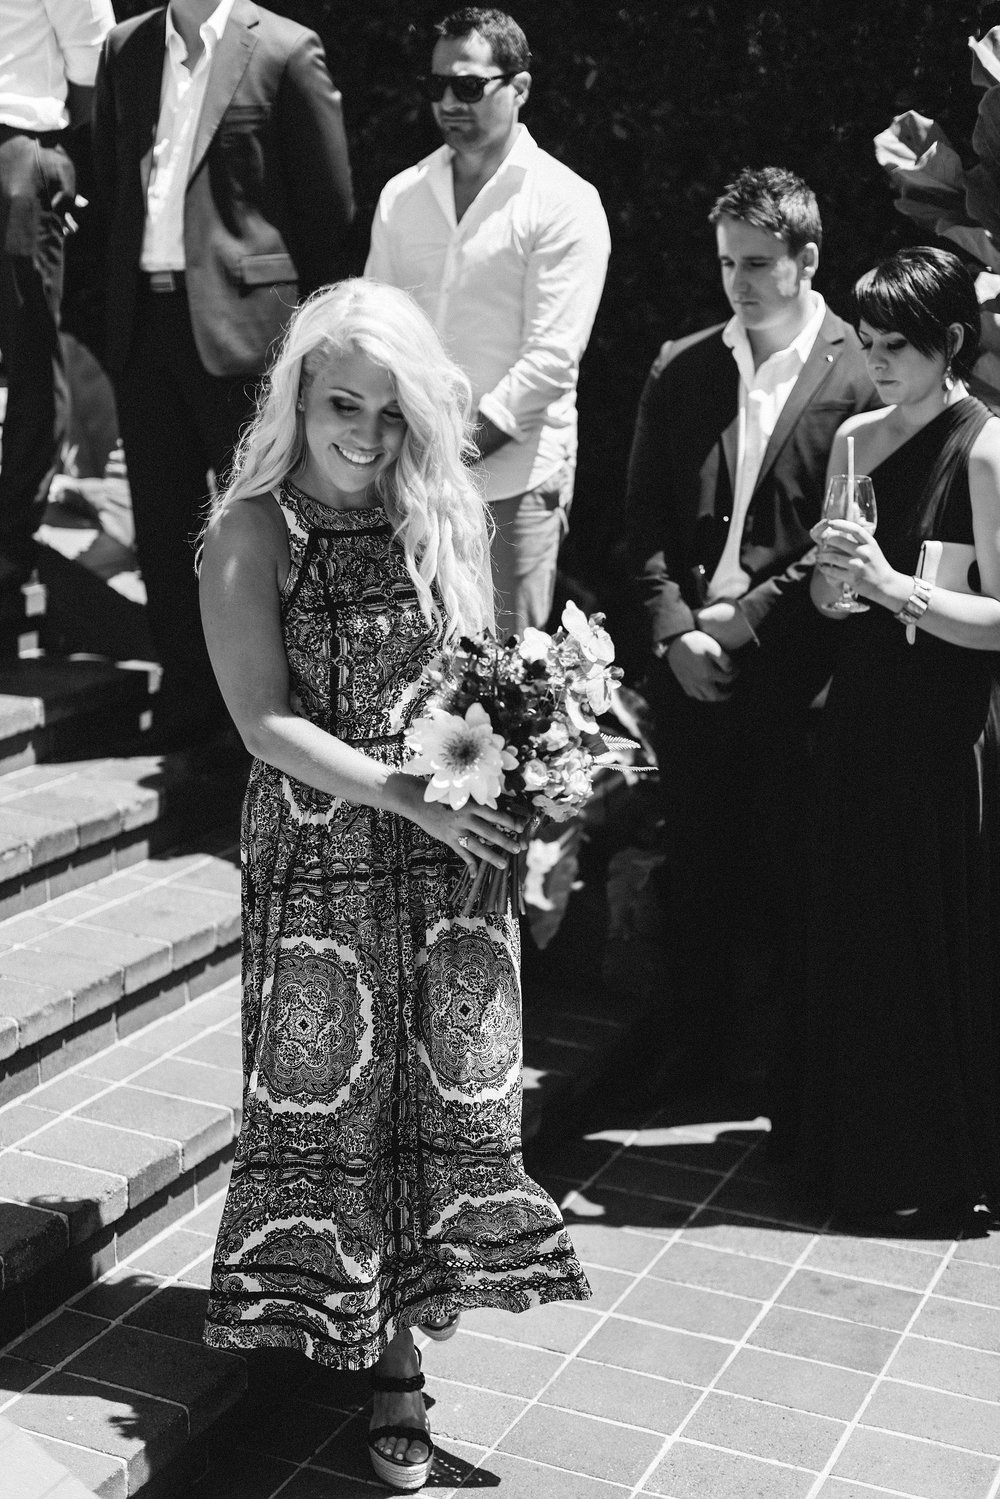 moby_dicks_whale_beach_wedding_photography_0155-min.jpg